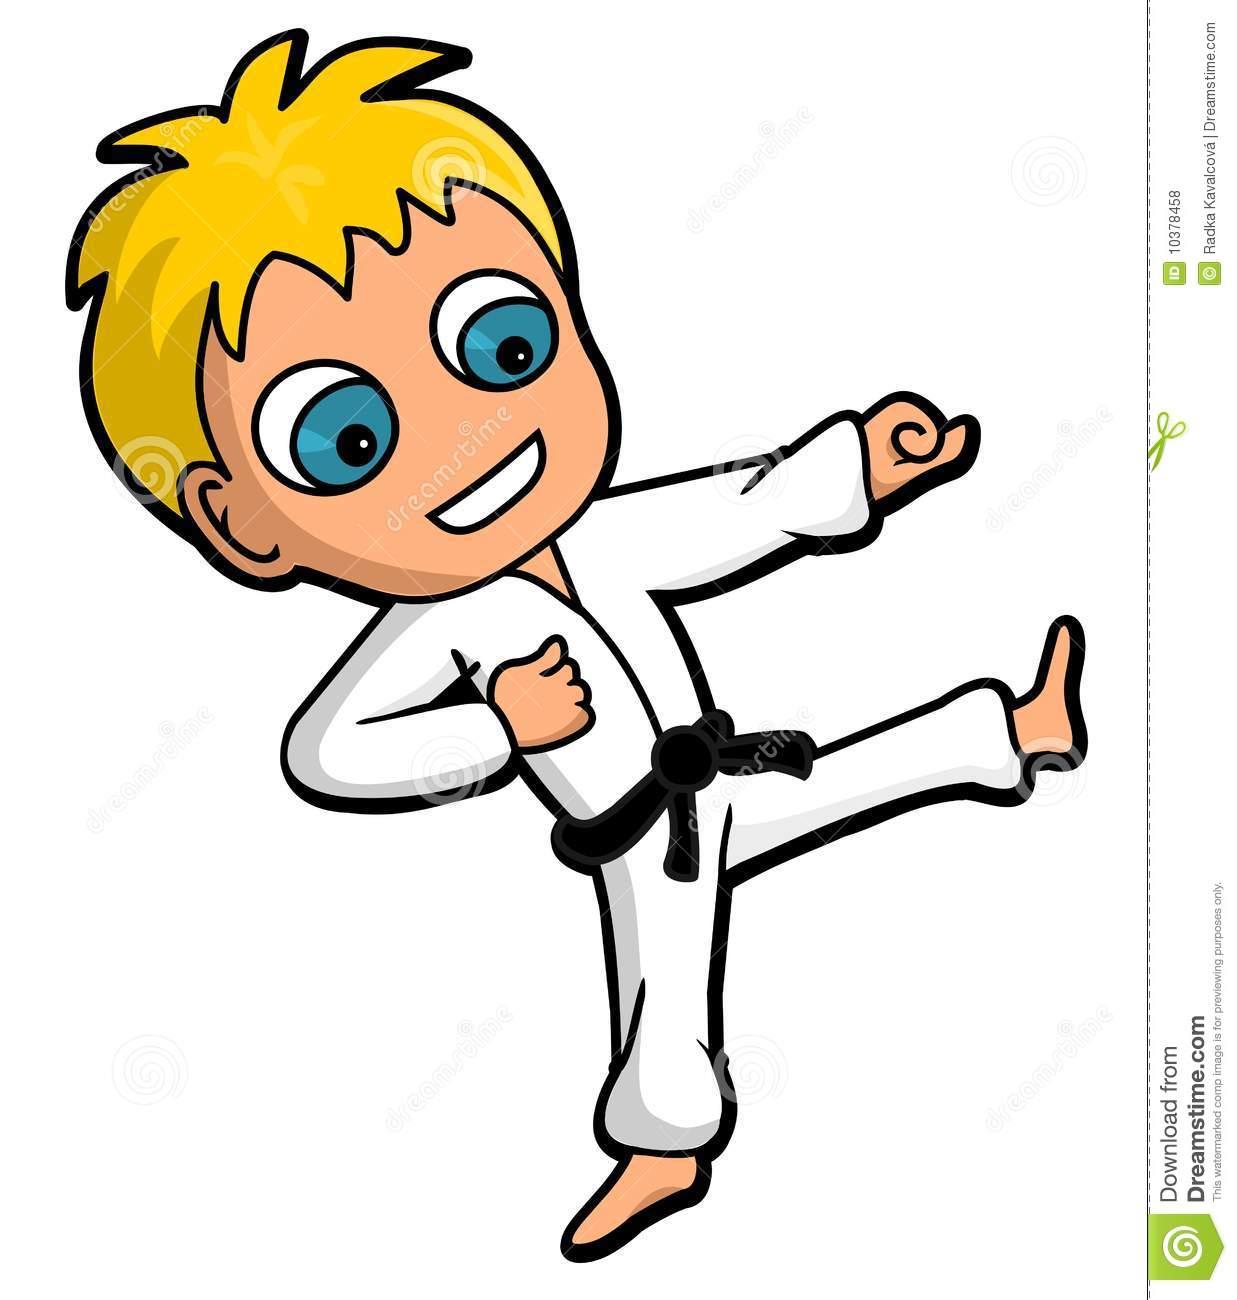 Karate kids clipart jpg freeuse download Karate kid   Clipart Panda - Free Clipart Images jpg freeuse download